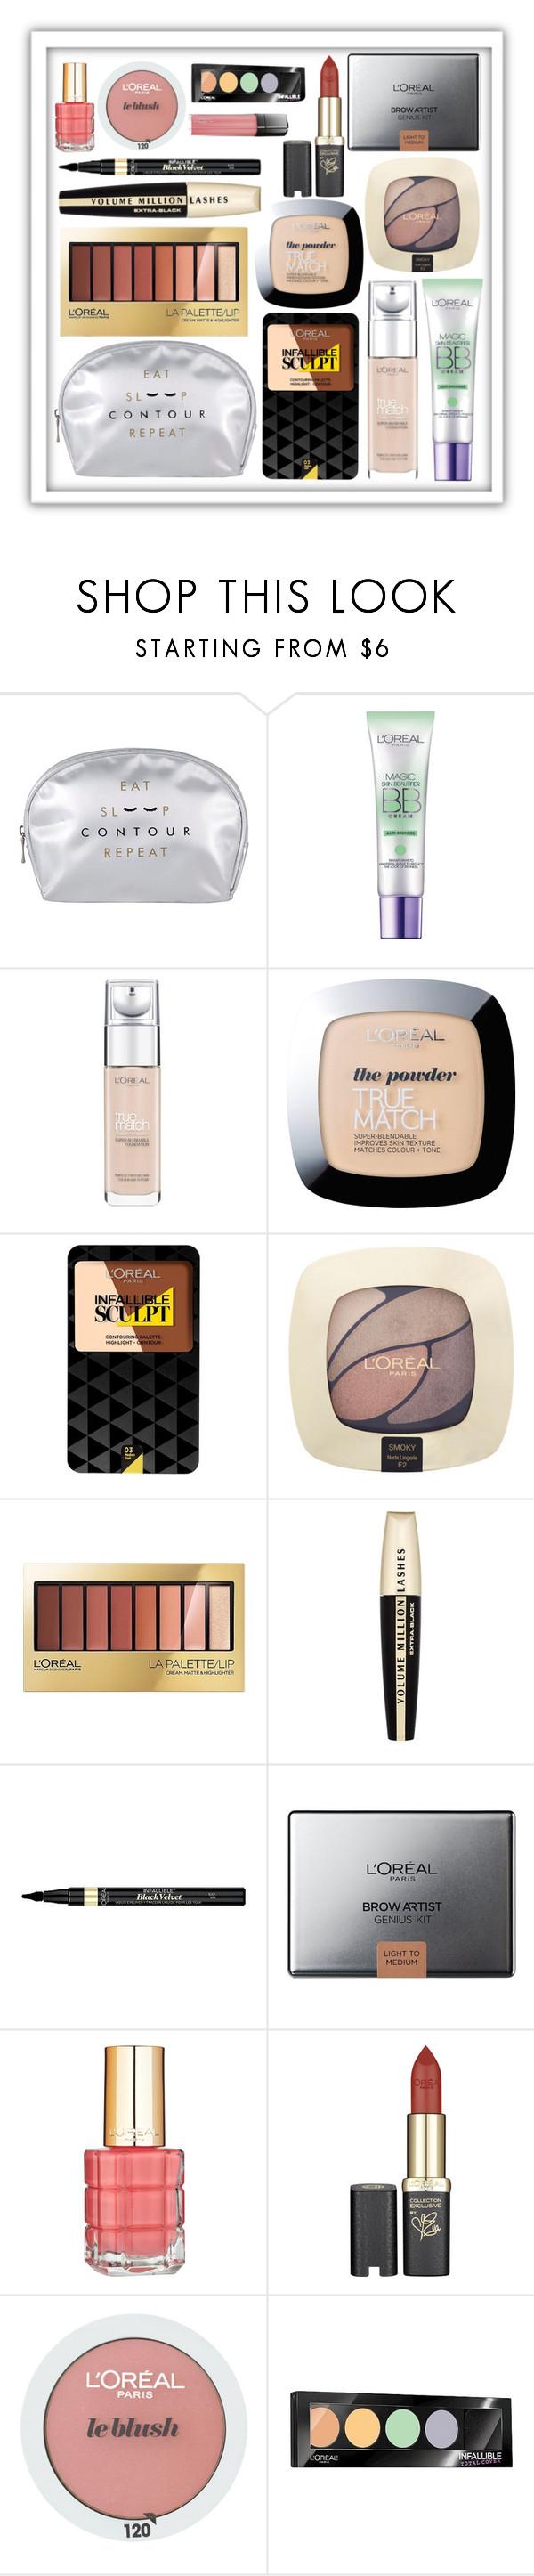 """L'oreal Paris beauty bag"" by dubaileila ❤ liked on Polyvore featuring beauty and L'Oréal Paris"